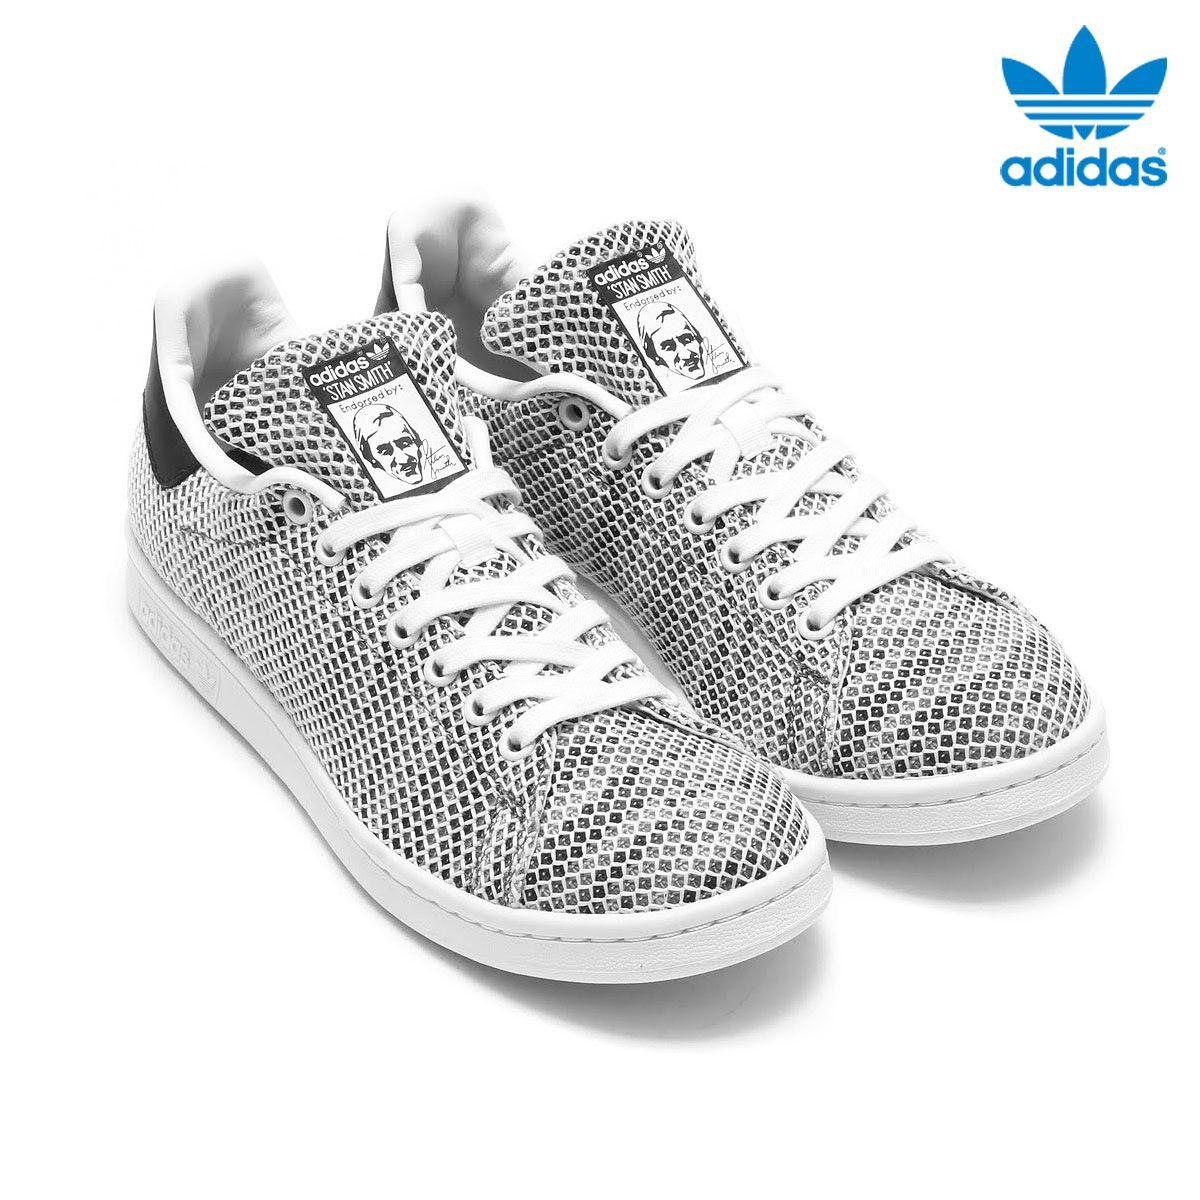 6ecdf78e19ef Adidas Originals STAN SMITH Running White   Running White   Core Black